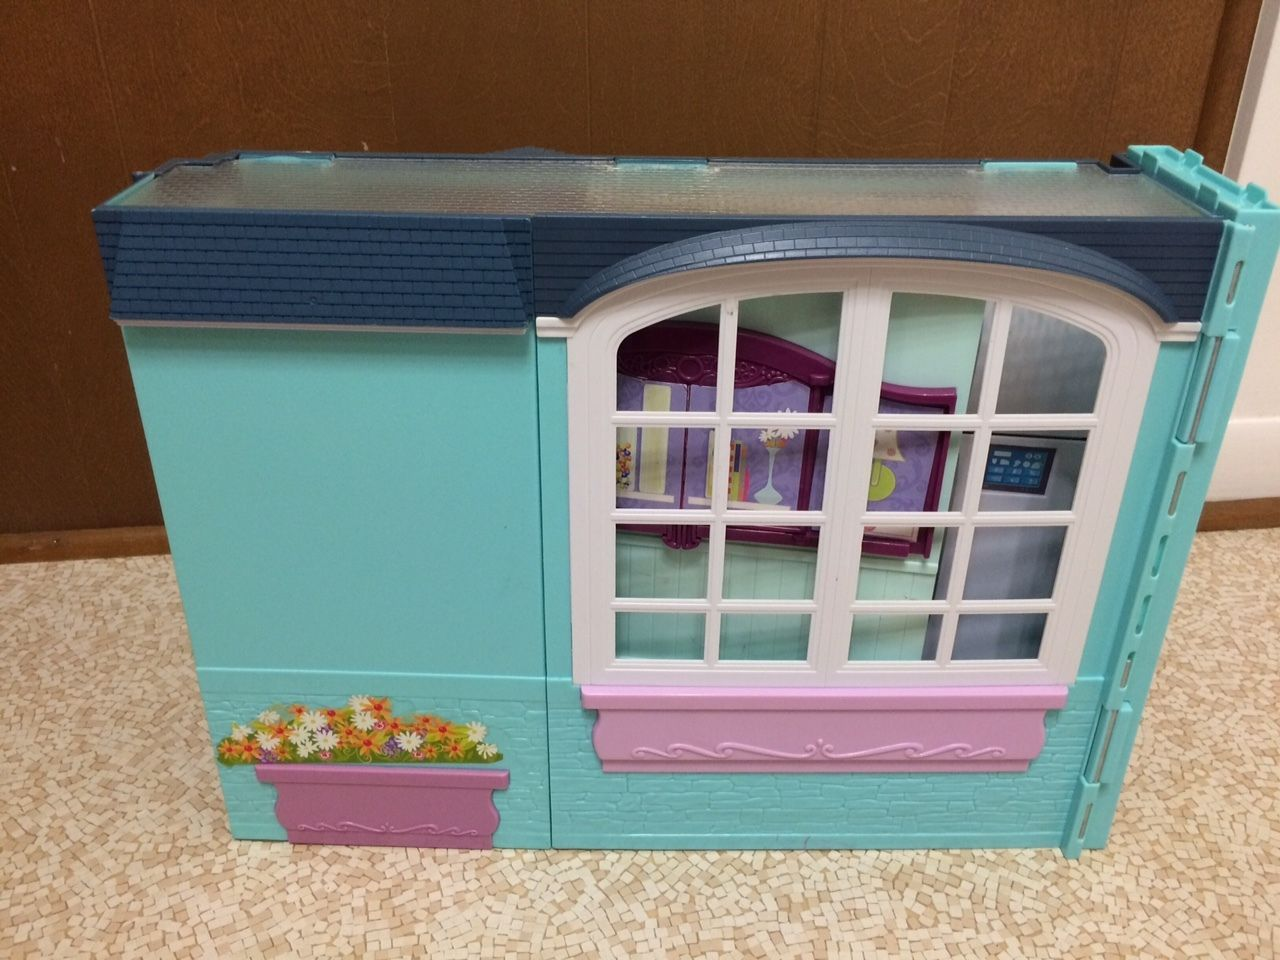 2007 Barbie Doll My House Playset Fold Up Dollhouse Kitchen Bathroom ...